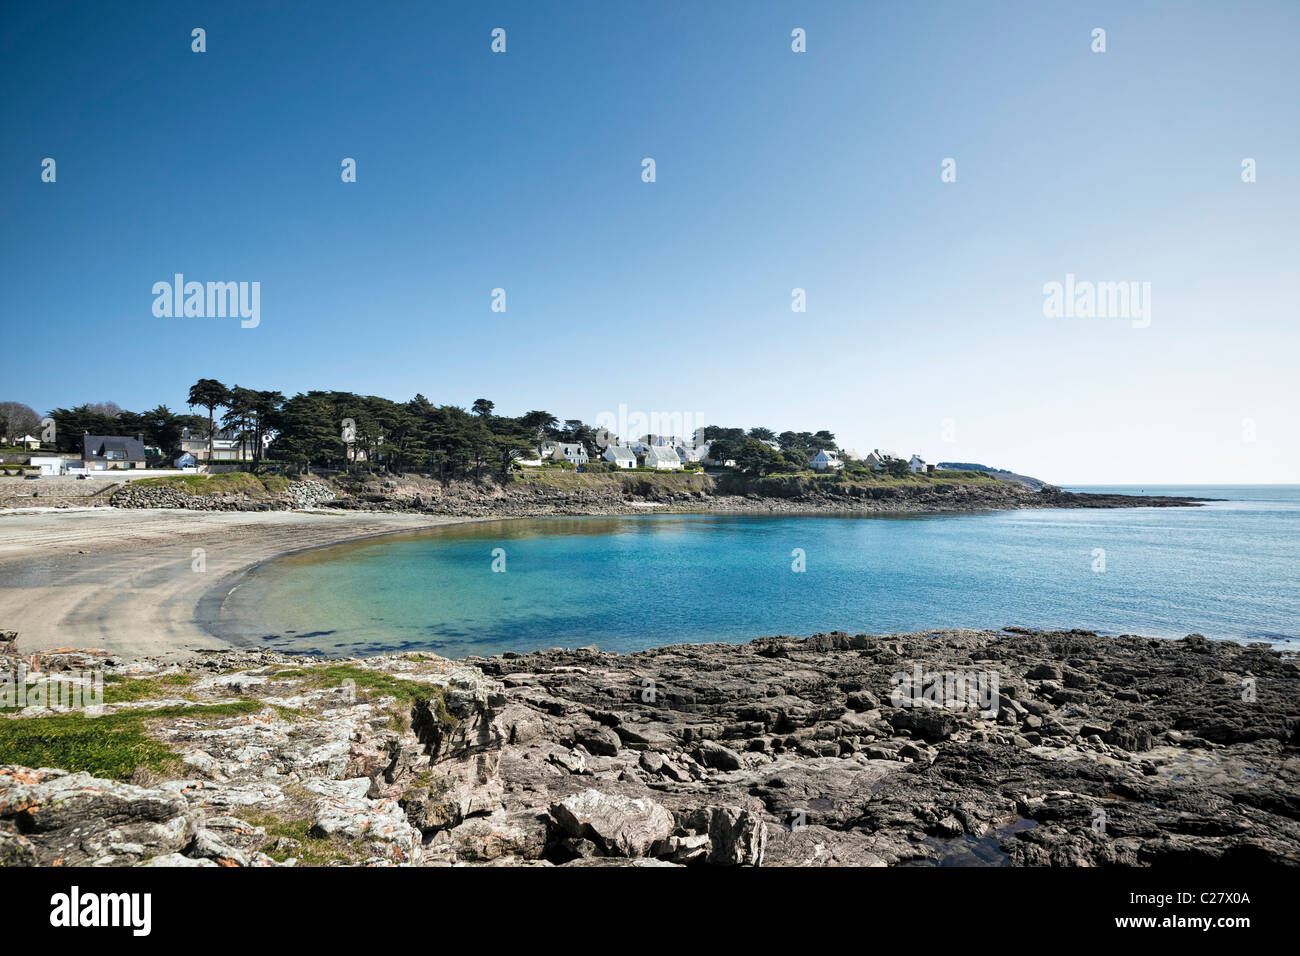 Port Navalo, near Arzon, Presqu'île de Rhuys, Gulf of Morbihan, Brittany, France, Europe - Stock Image